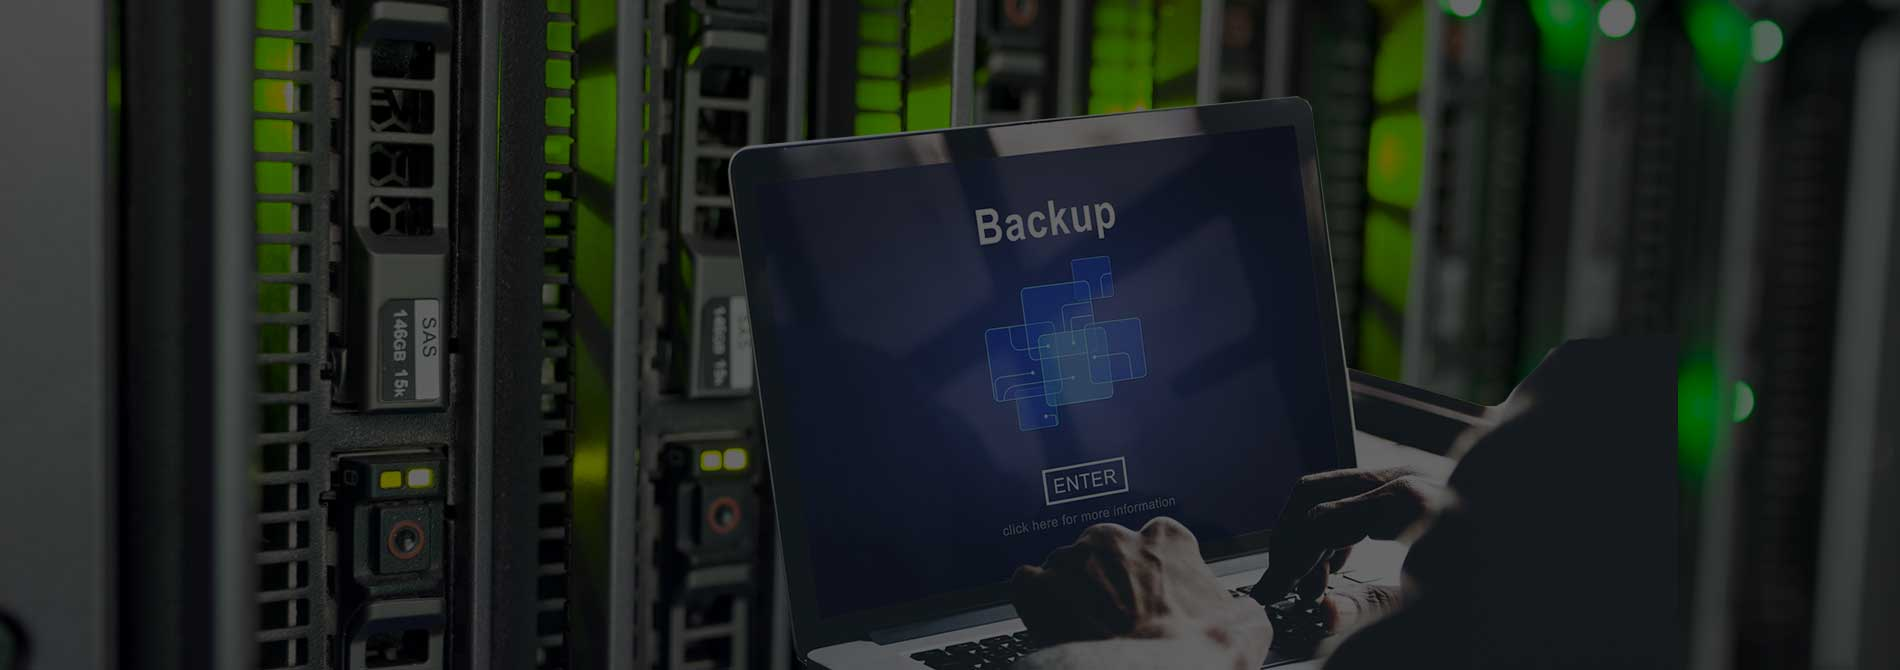 BannerBackup Online Convex